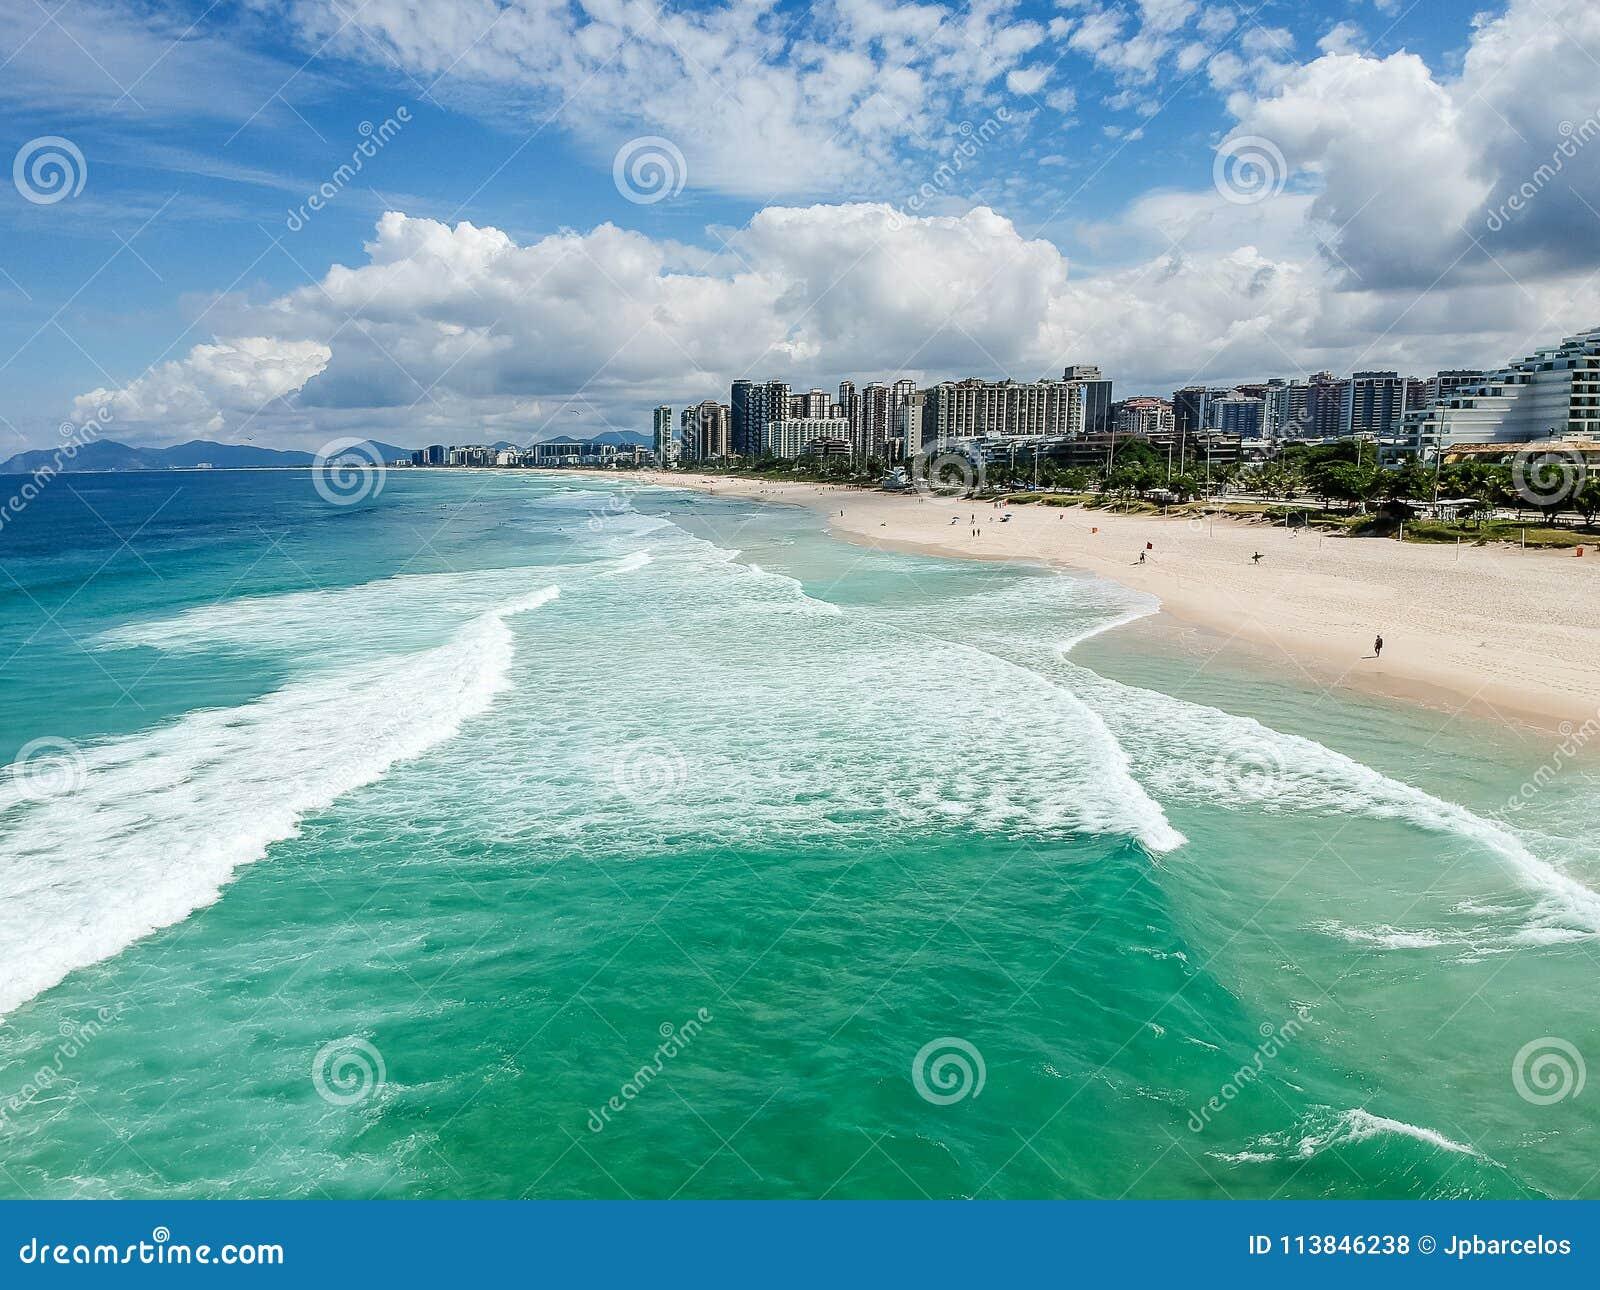 Photo de bourdon de plage de Barra da Tijuca, Rio de Janeiro, Brésil